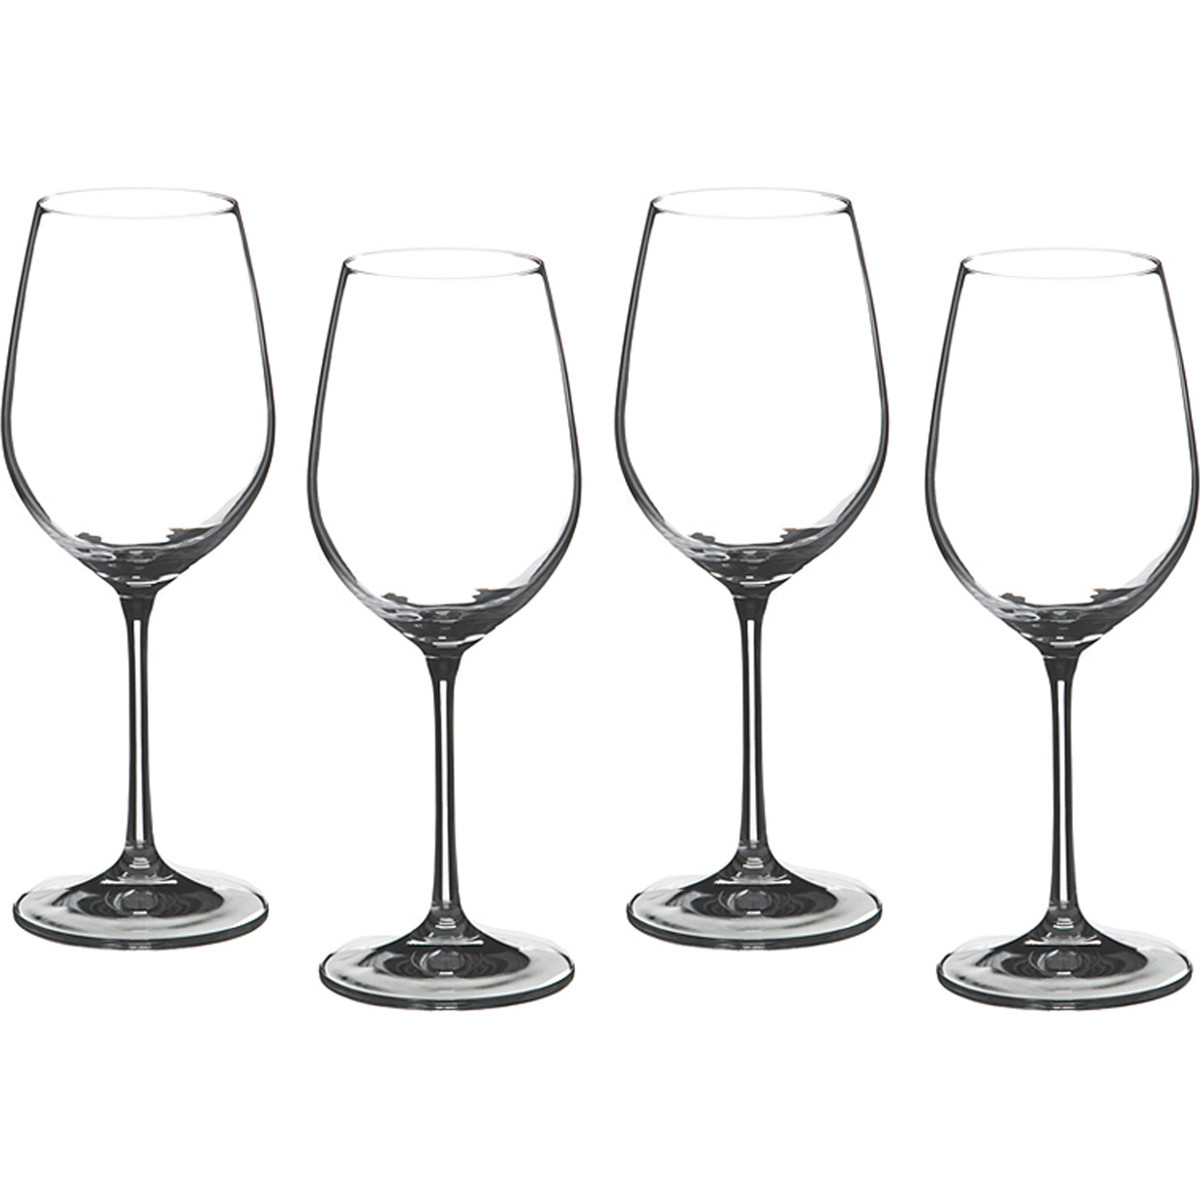 {} Bohemia Crystal Набор бокалов для вина Rowena  (24 см - 4 шт) набор для кофе crystal bohemia mokko 4 предмета